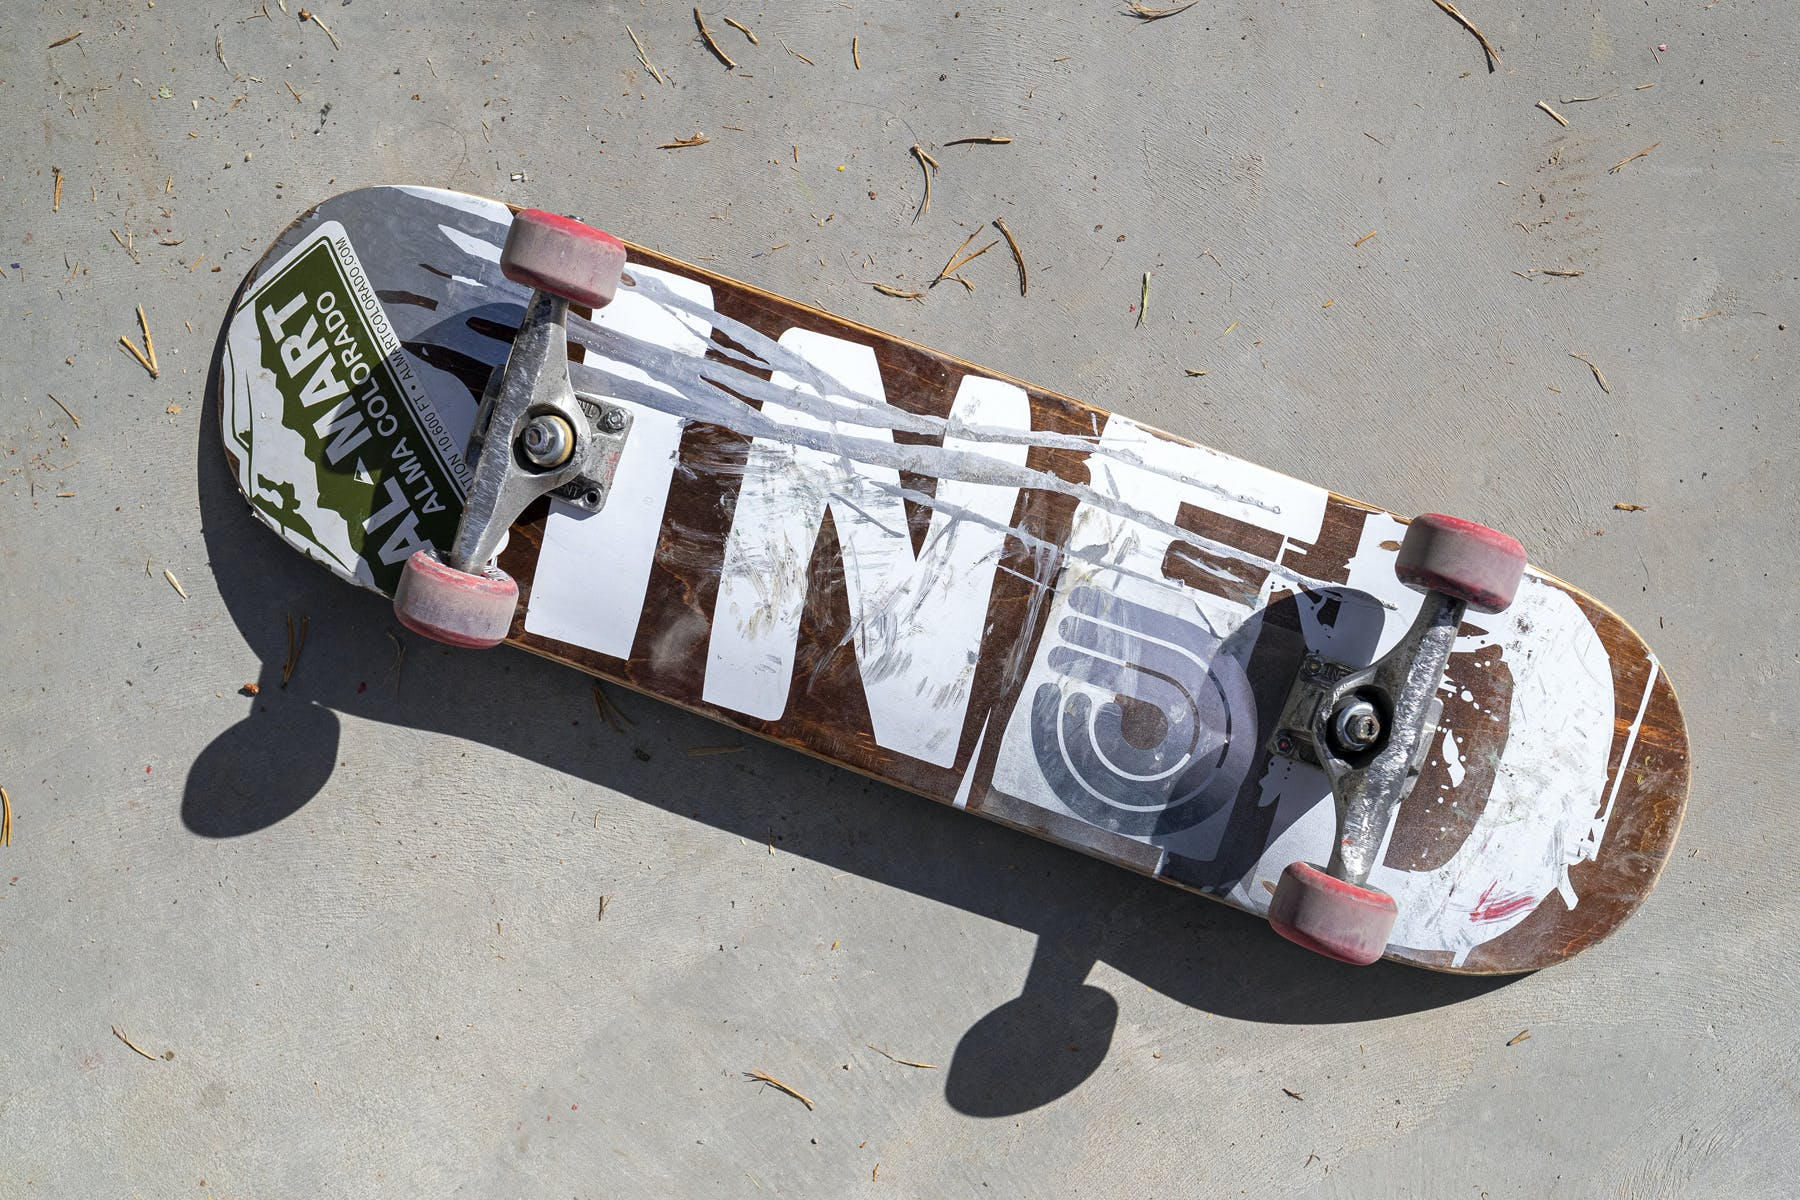 Sined Skateboards